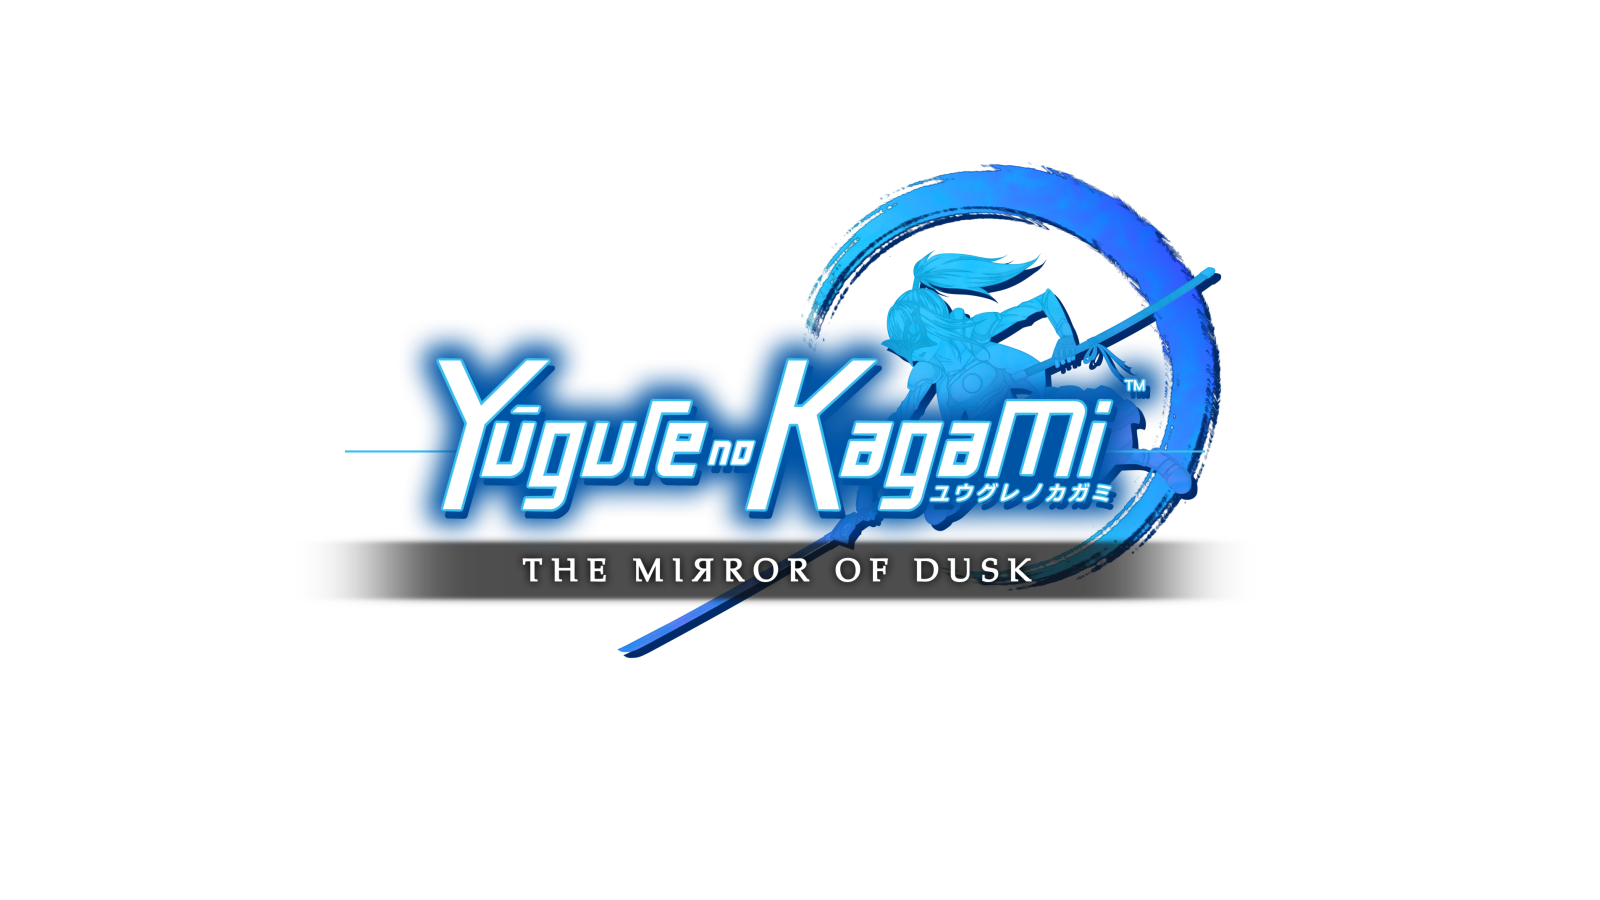 Yugure no Kagami - The Mirror of Dusk